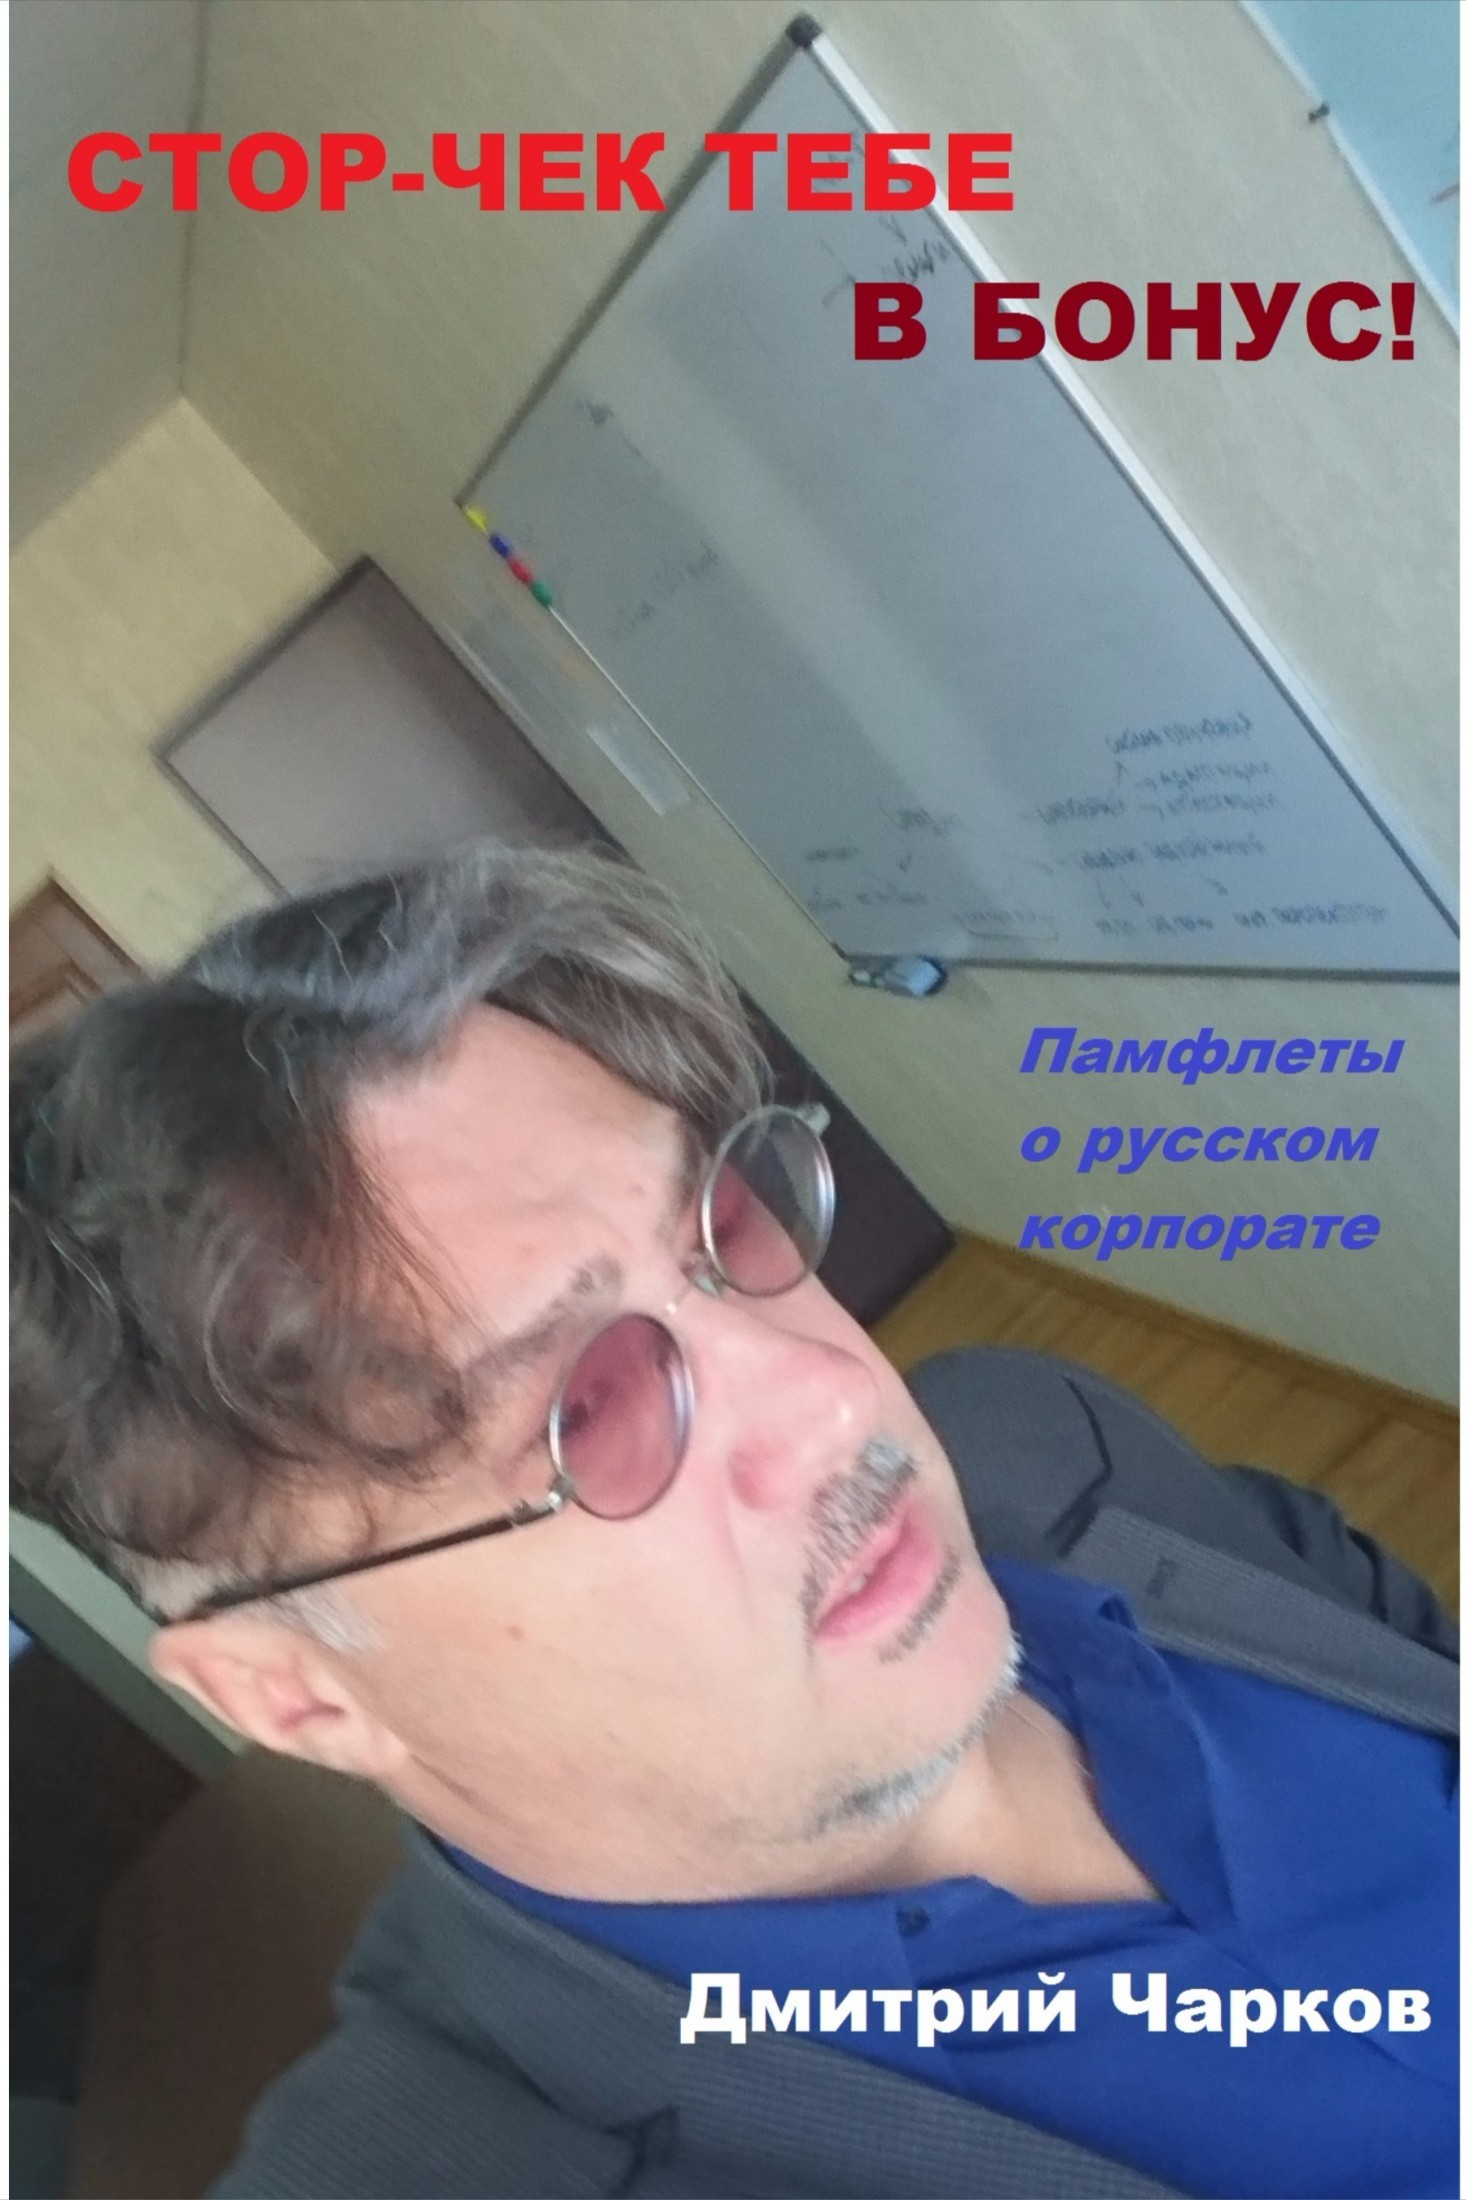 Обложка книги. Автор - Дмитрий Чарков